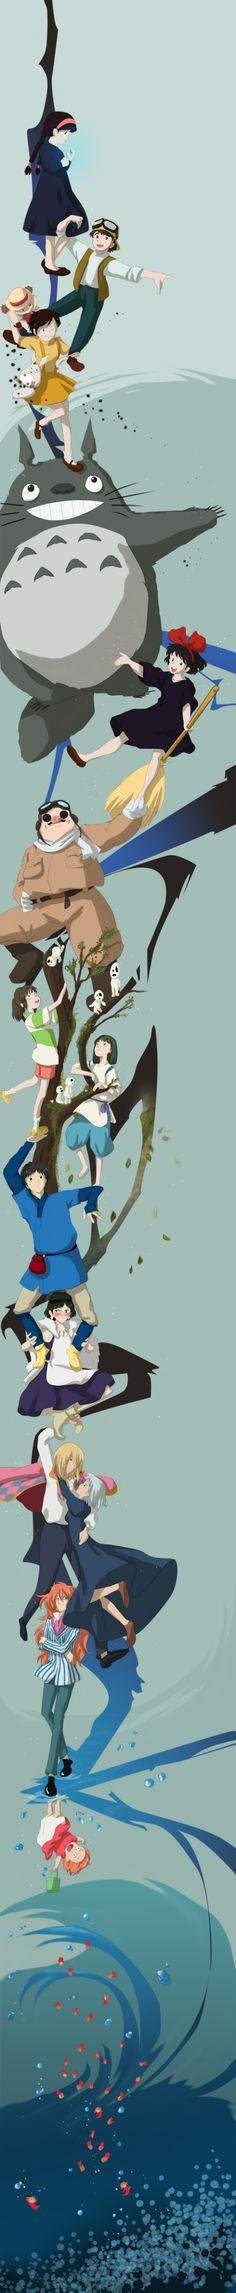 Studio Ghibli Characters, Japan